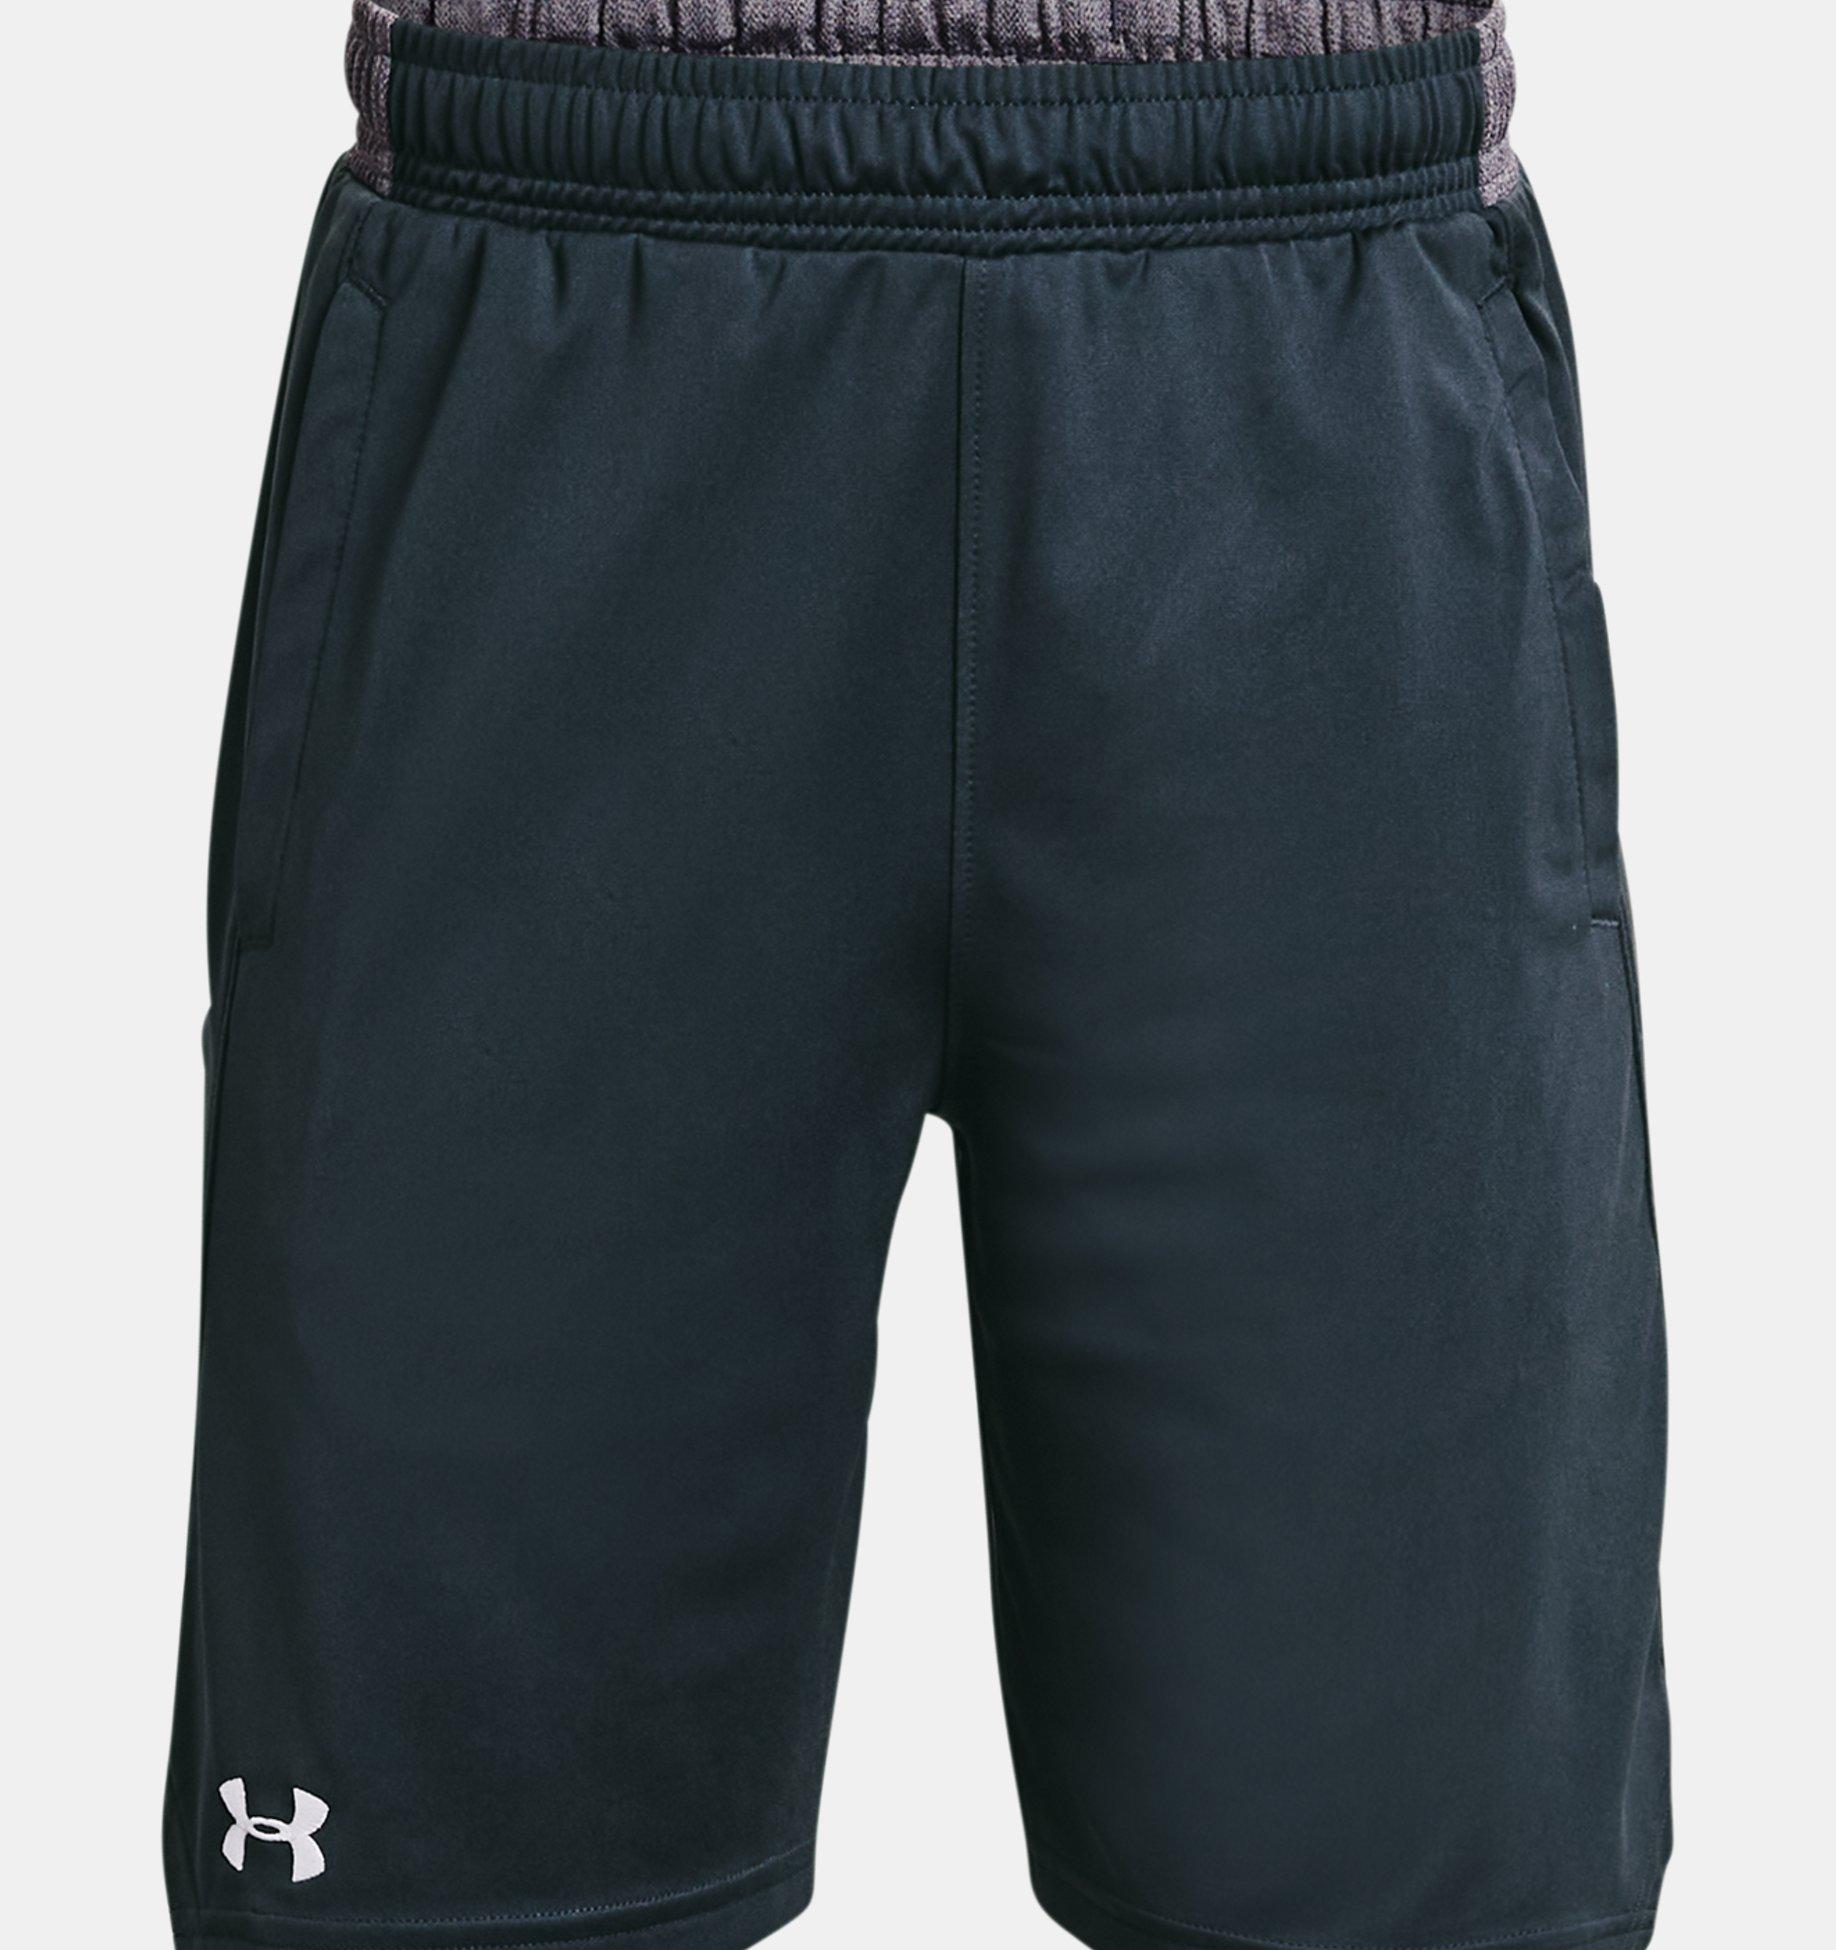 Underarmour Boys UA Locker Pocketed Shorts